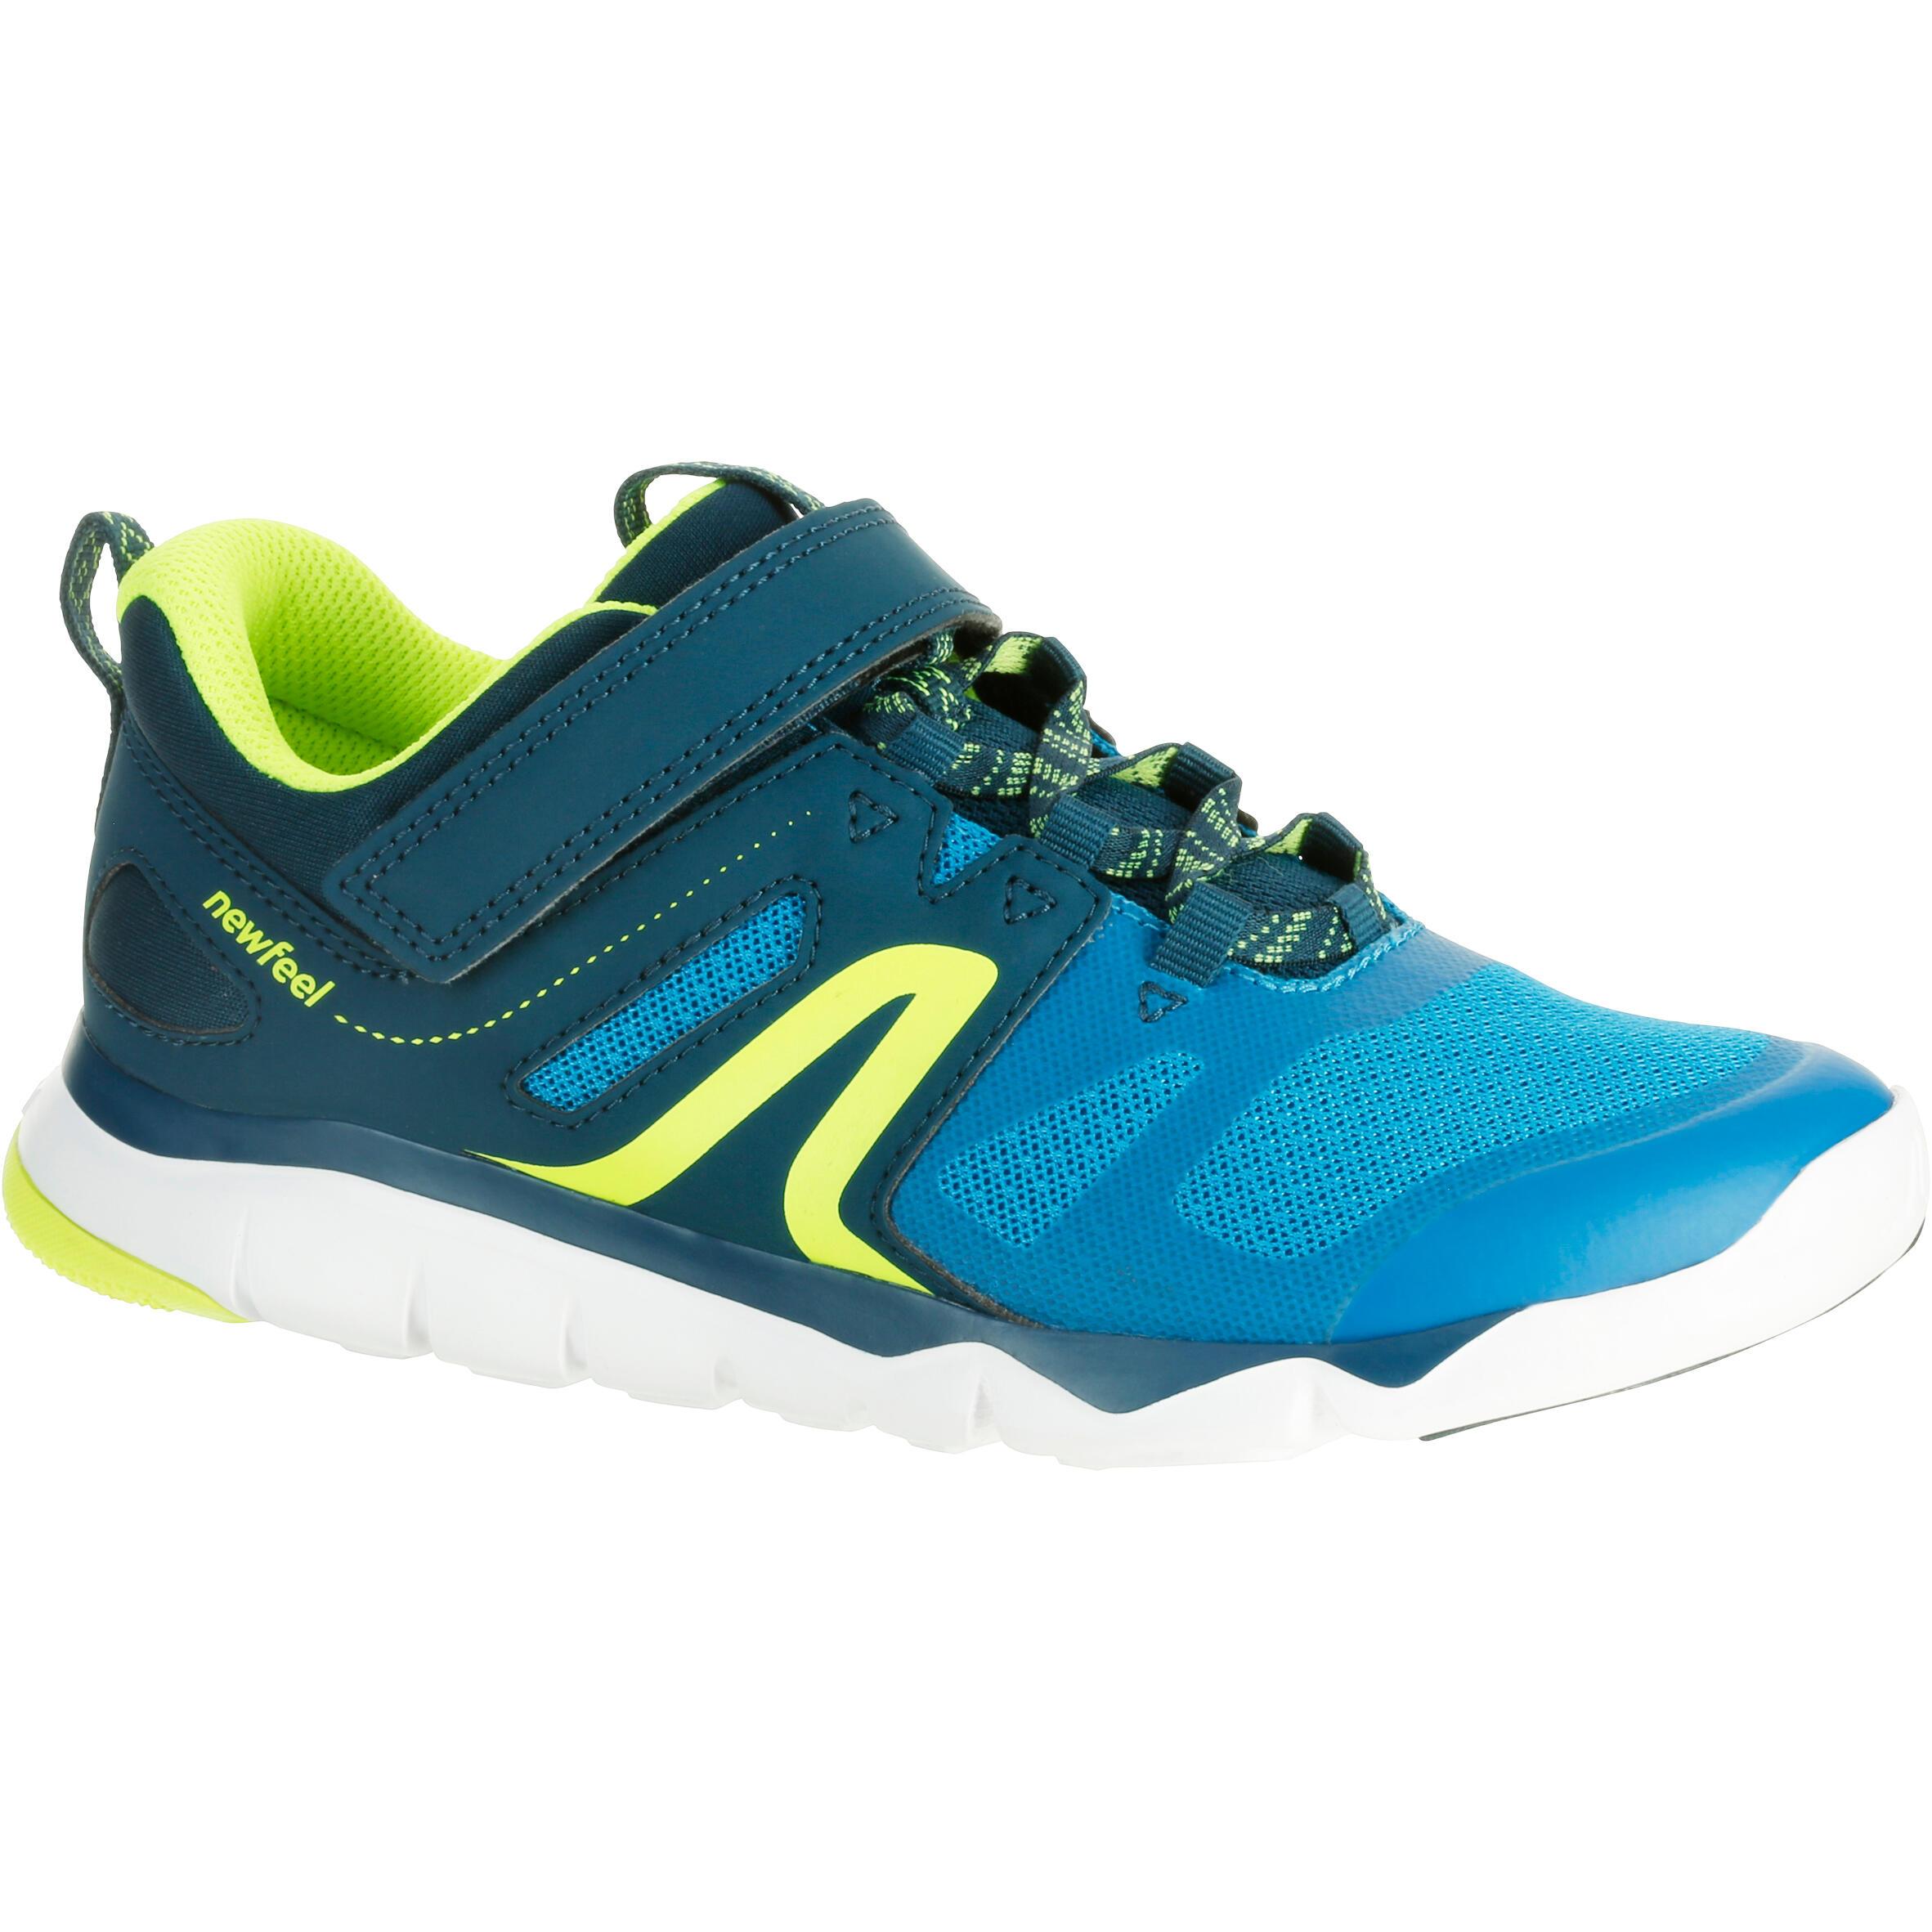 Tenis de caminata deportiva niños PW 540 azul / verde